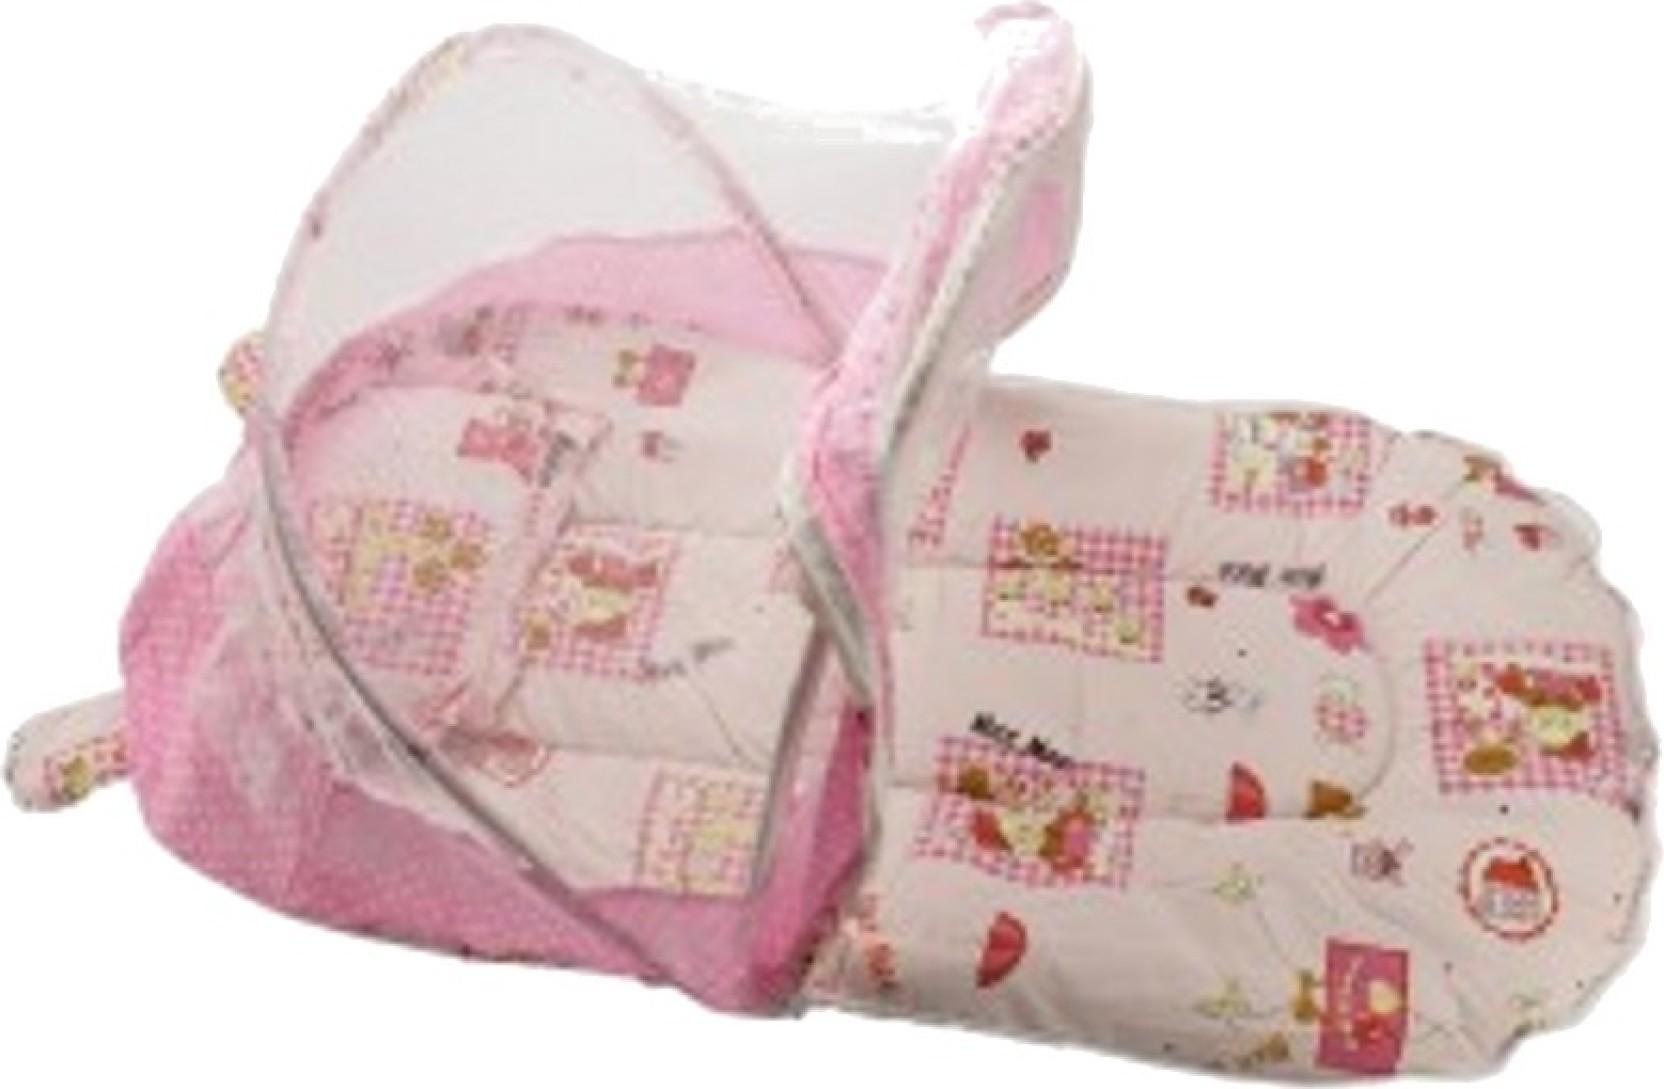 Baby Gift Set Flipkart : Mee baby mattress set with mosquito net price in india